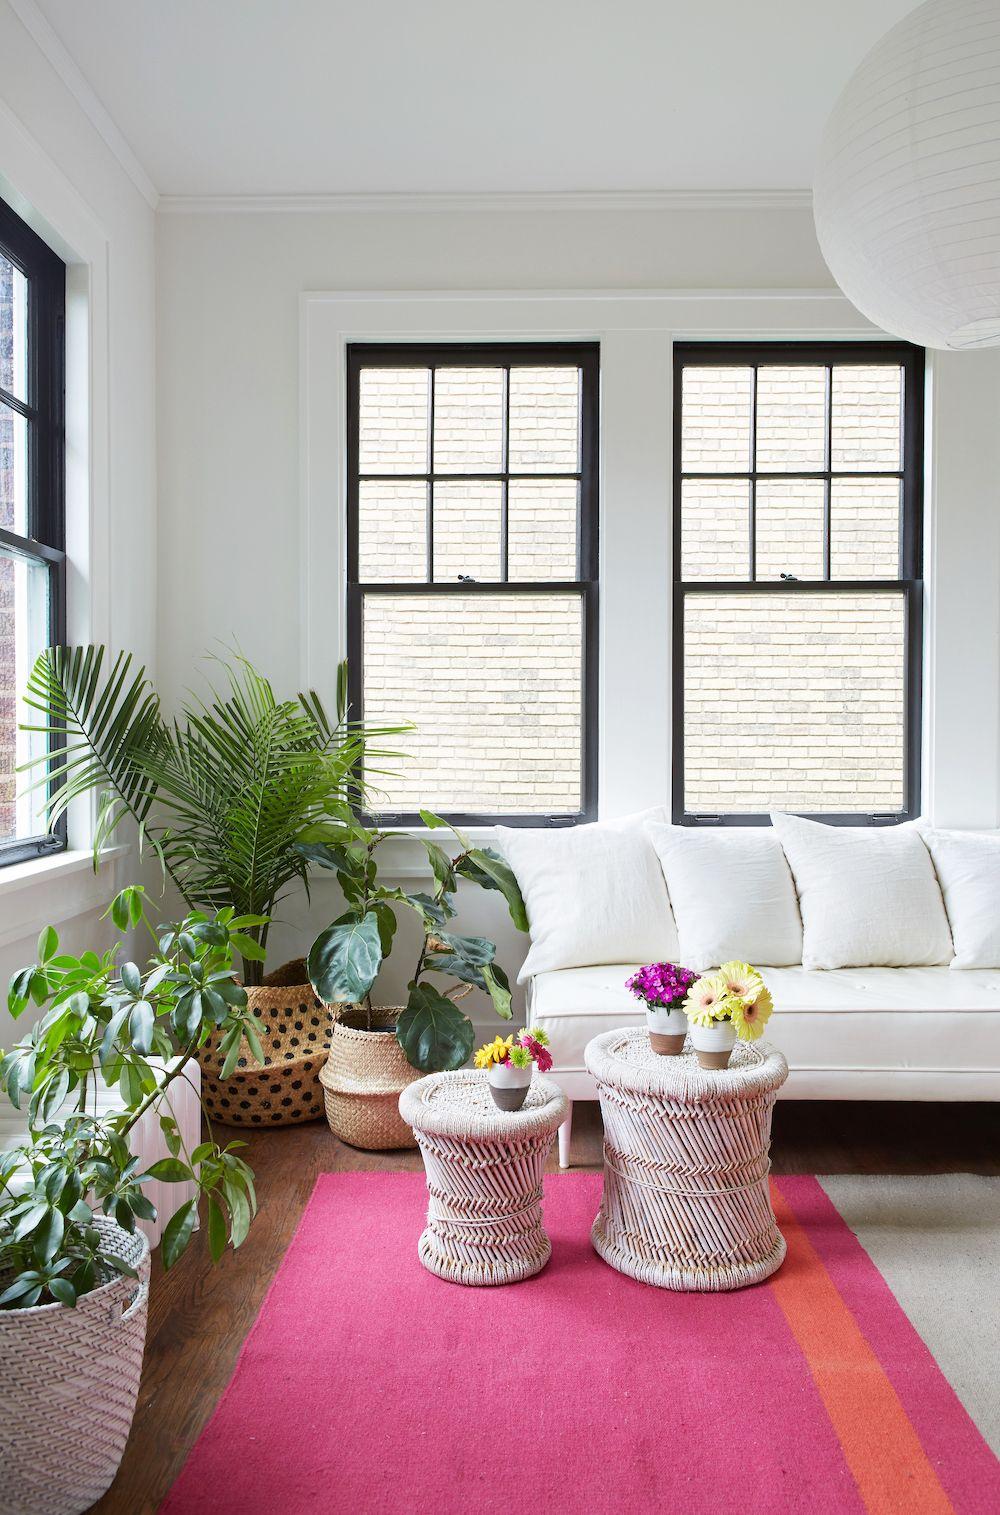 Sitting Room Decoration  Architecture Technology  Design-4586